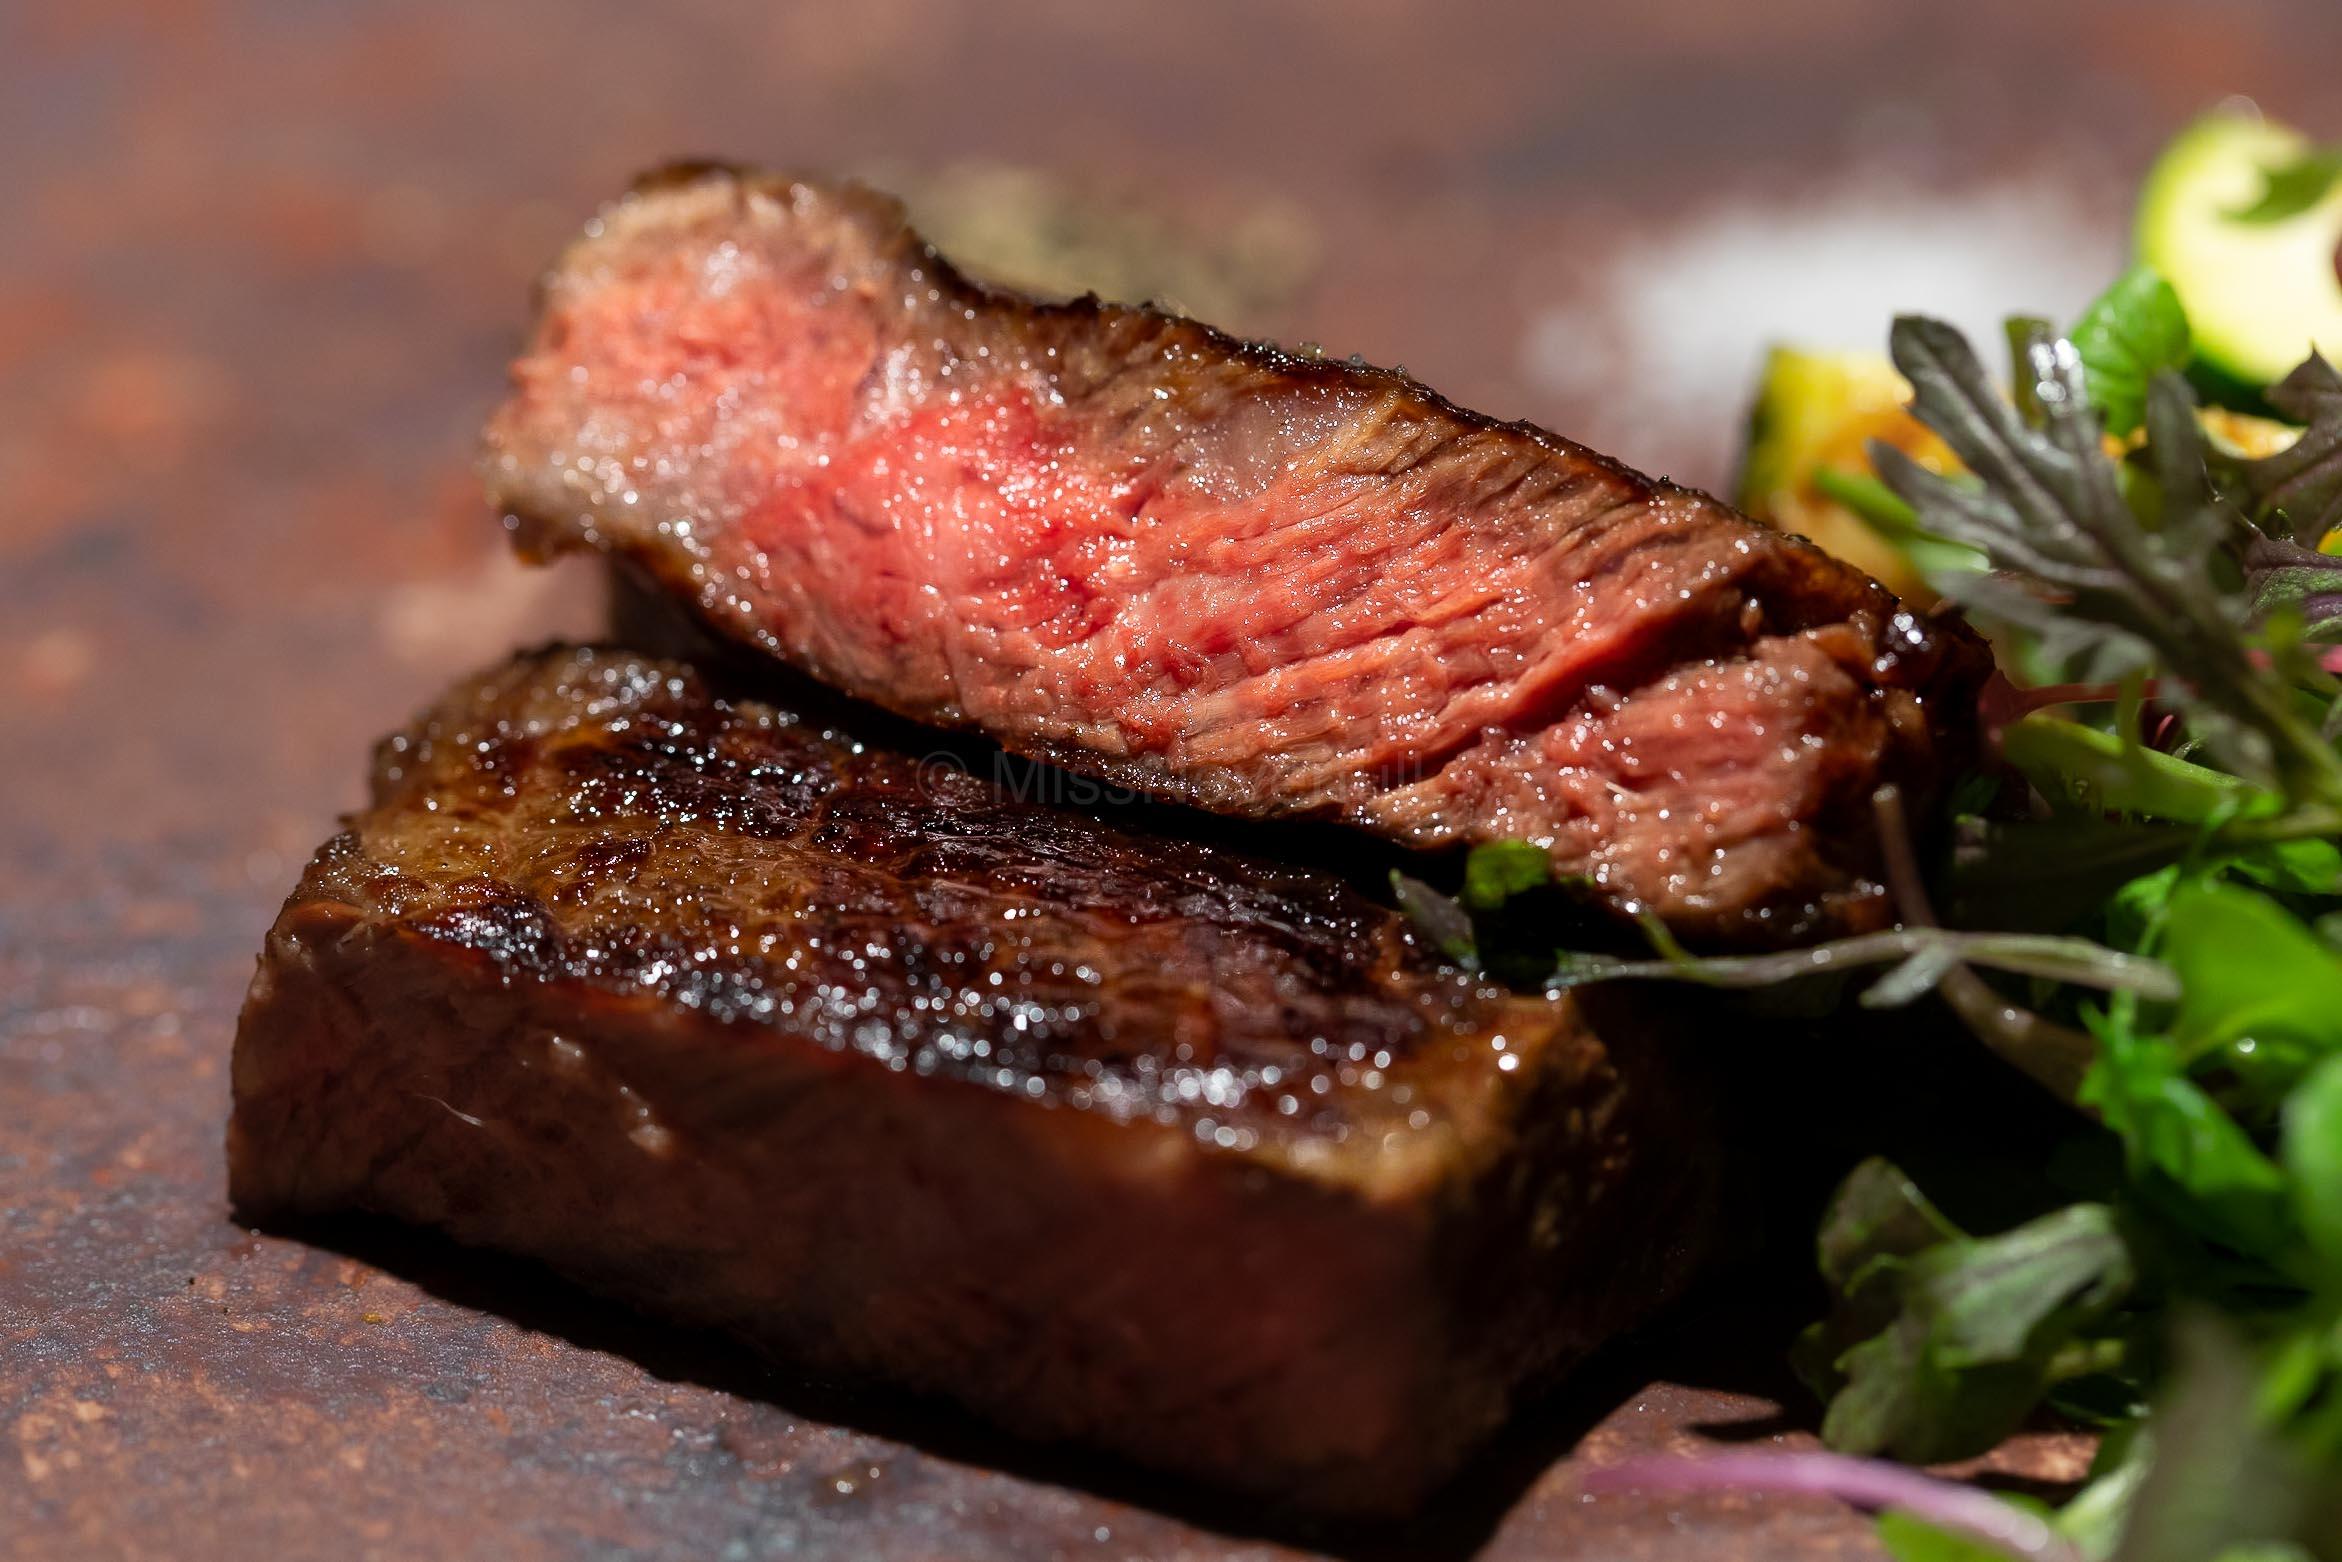 6. The signature Wood-fired Tacubo Wagyu Steak